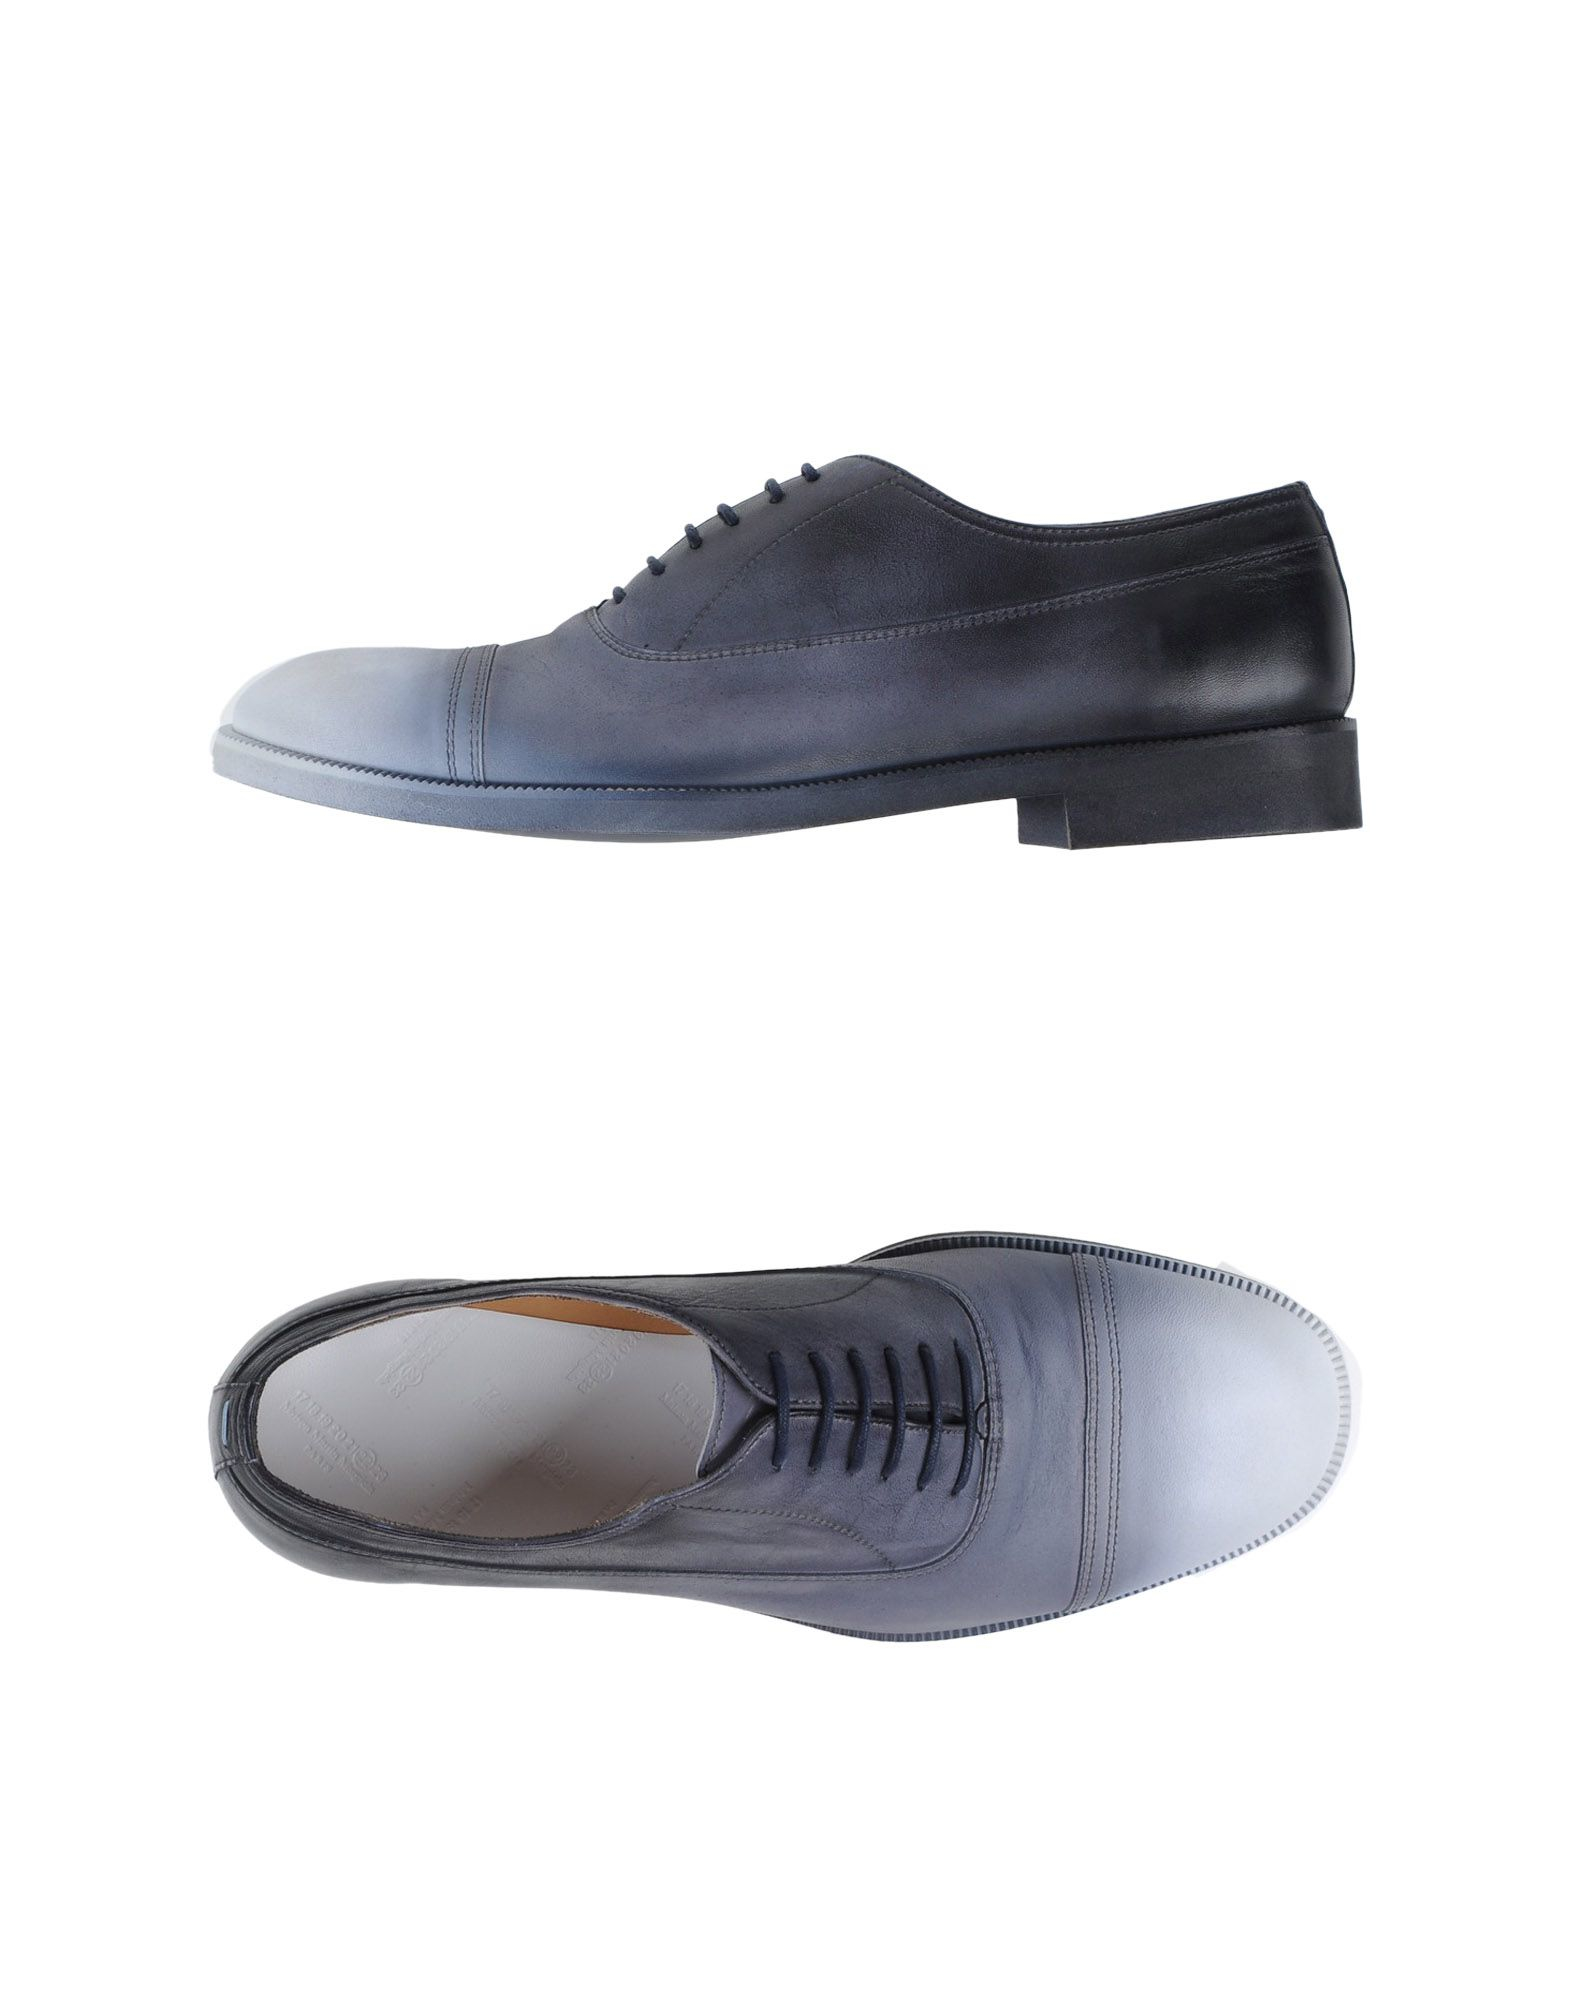 maison margiela lace up shoes in gray for men grey lyst. Black Bedroom Furniture Sets. Home Design Ideas